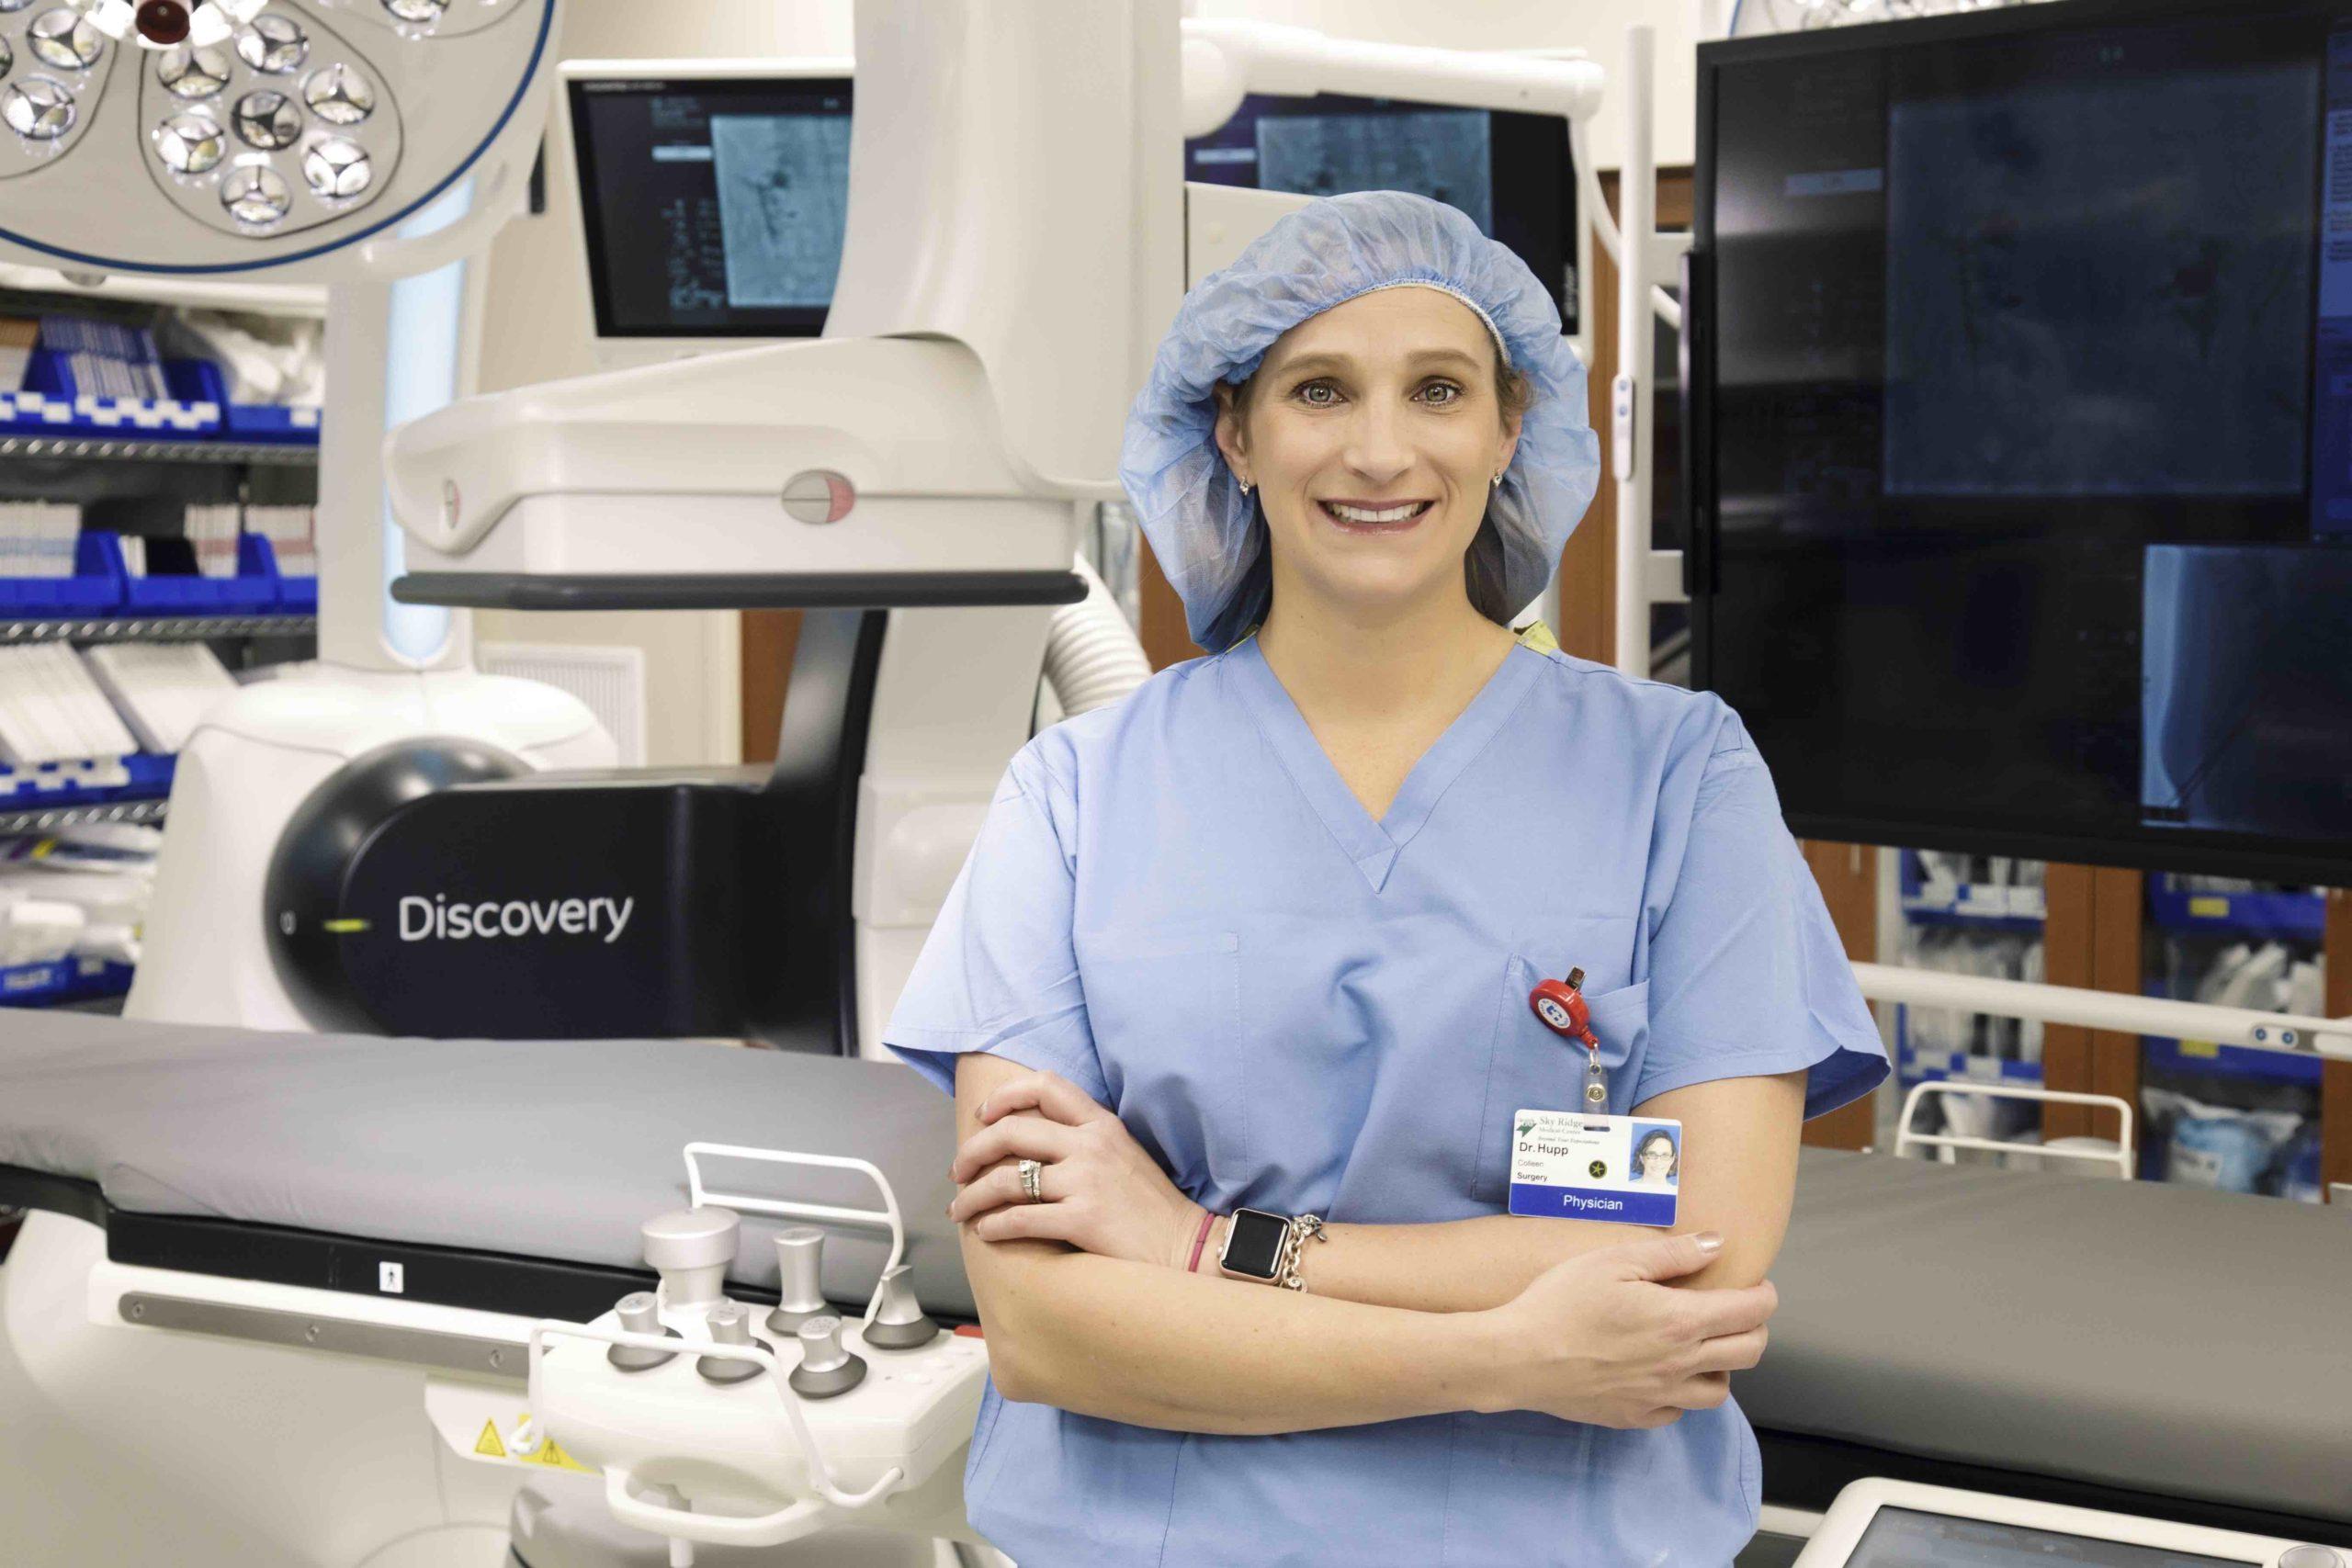 Dr. Colleen Hupp, vascular surgeon, CCSVA